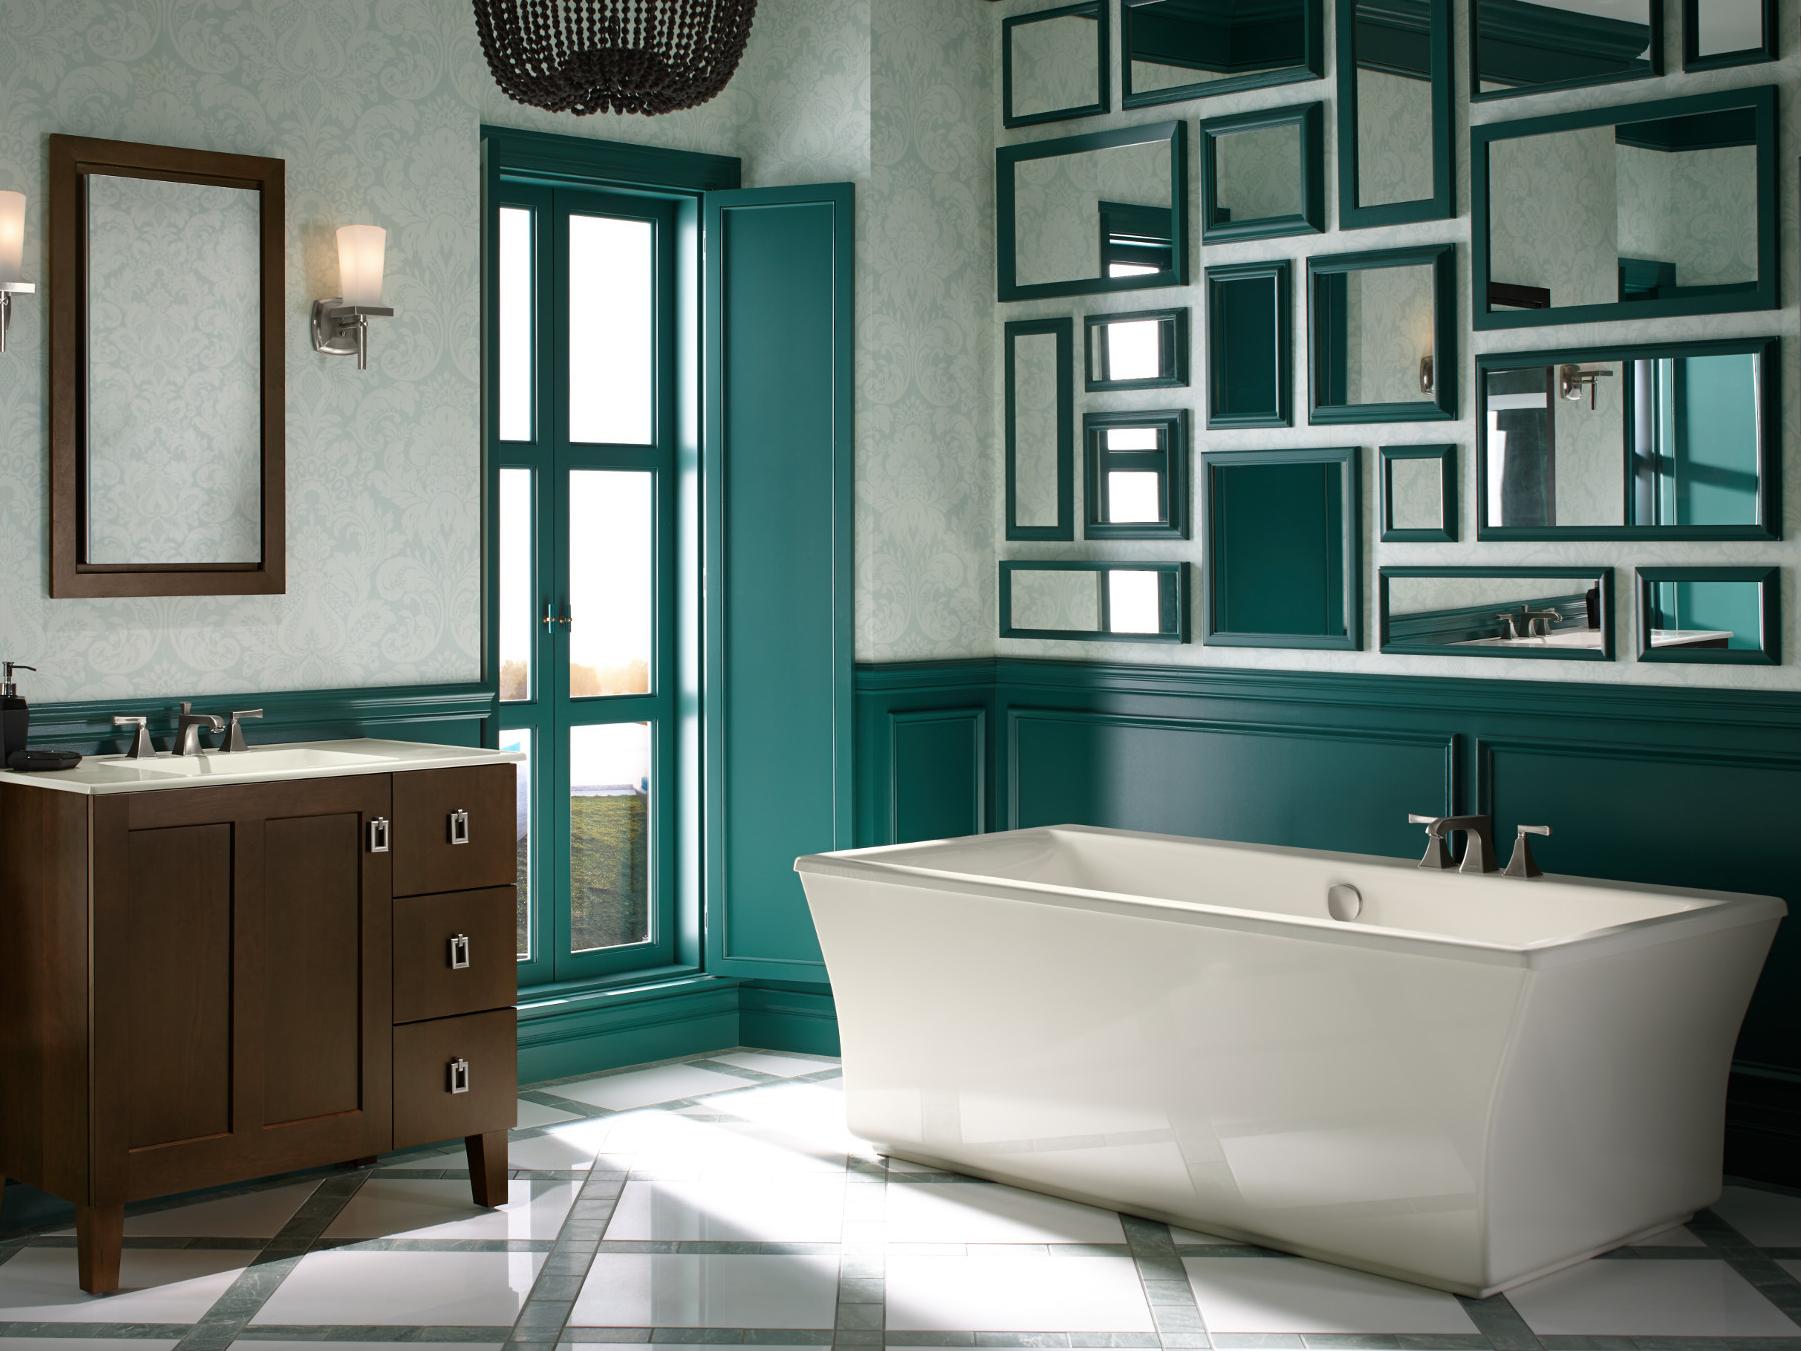 Kohler Bathroom Showrooms Nj Kohler Signature Store Pdi Plumbing